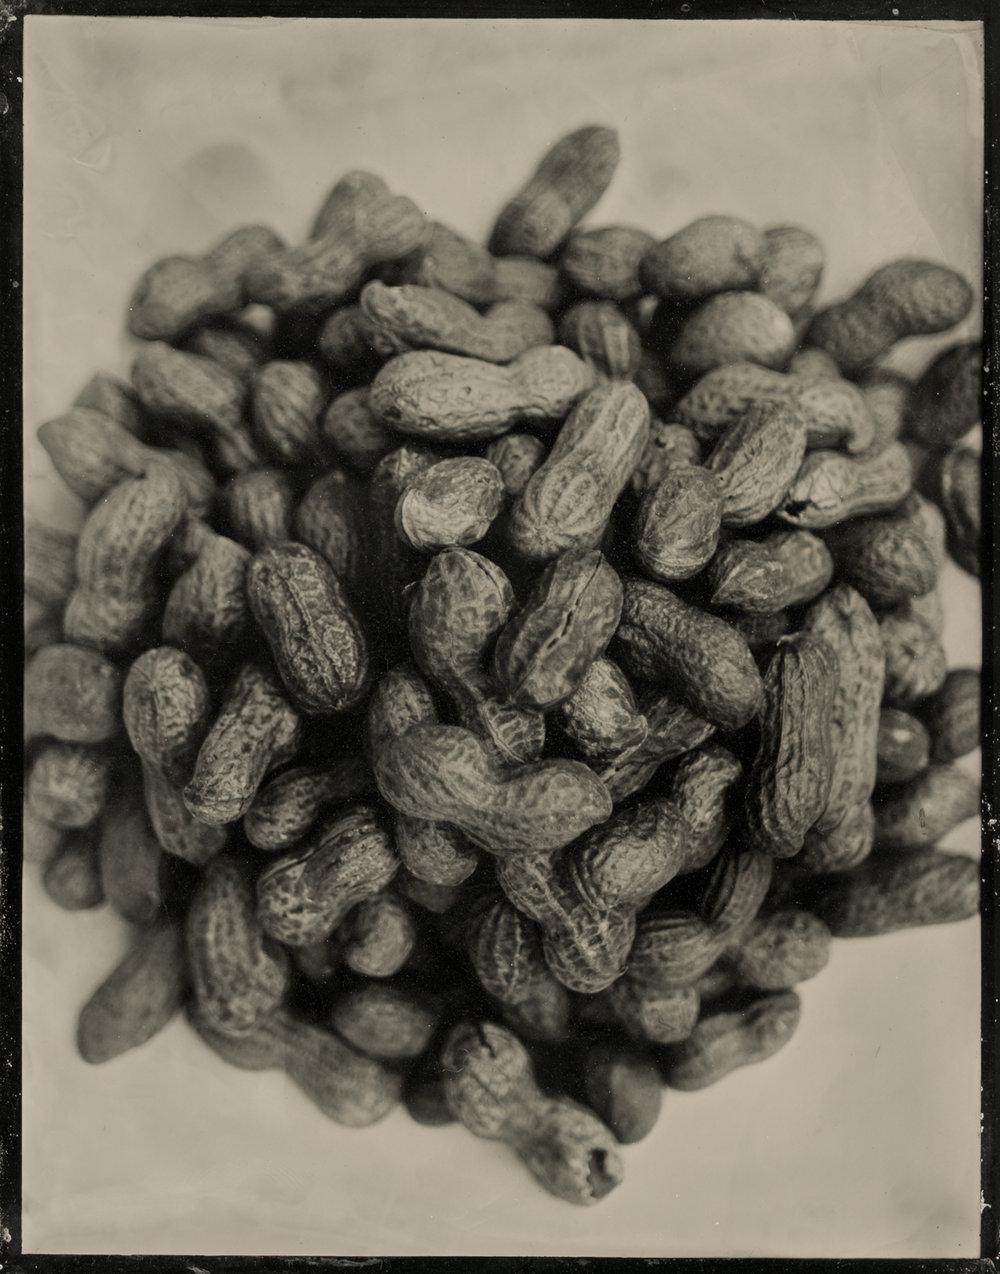 peanut 3b.jpg